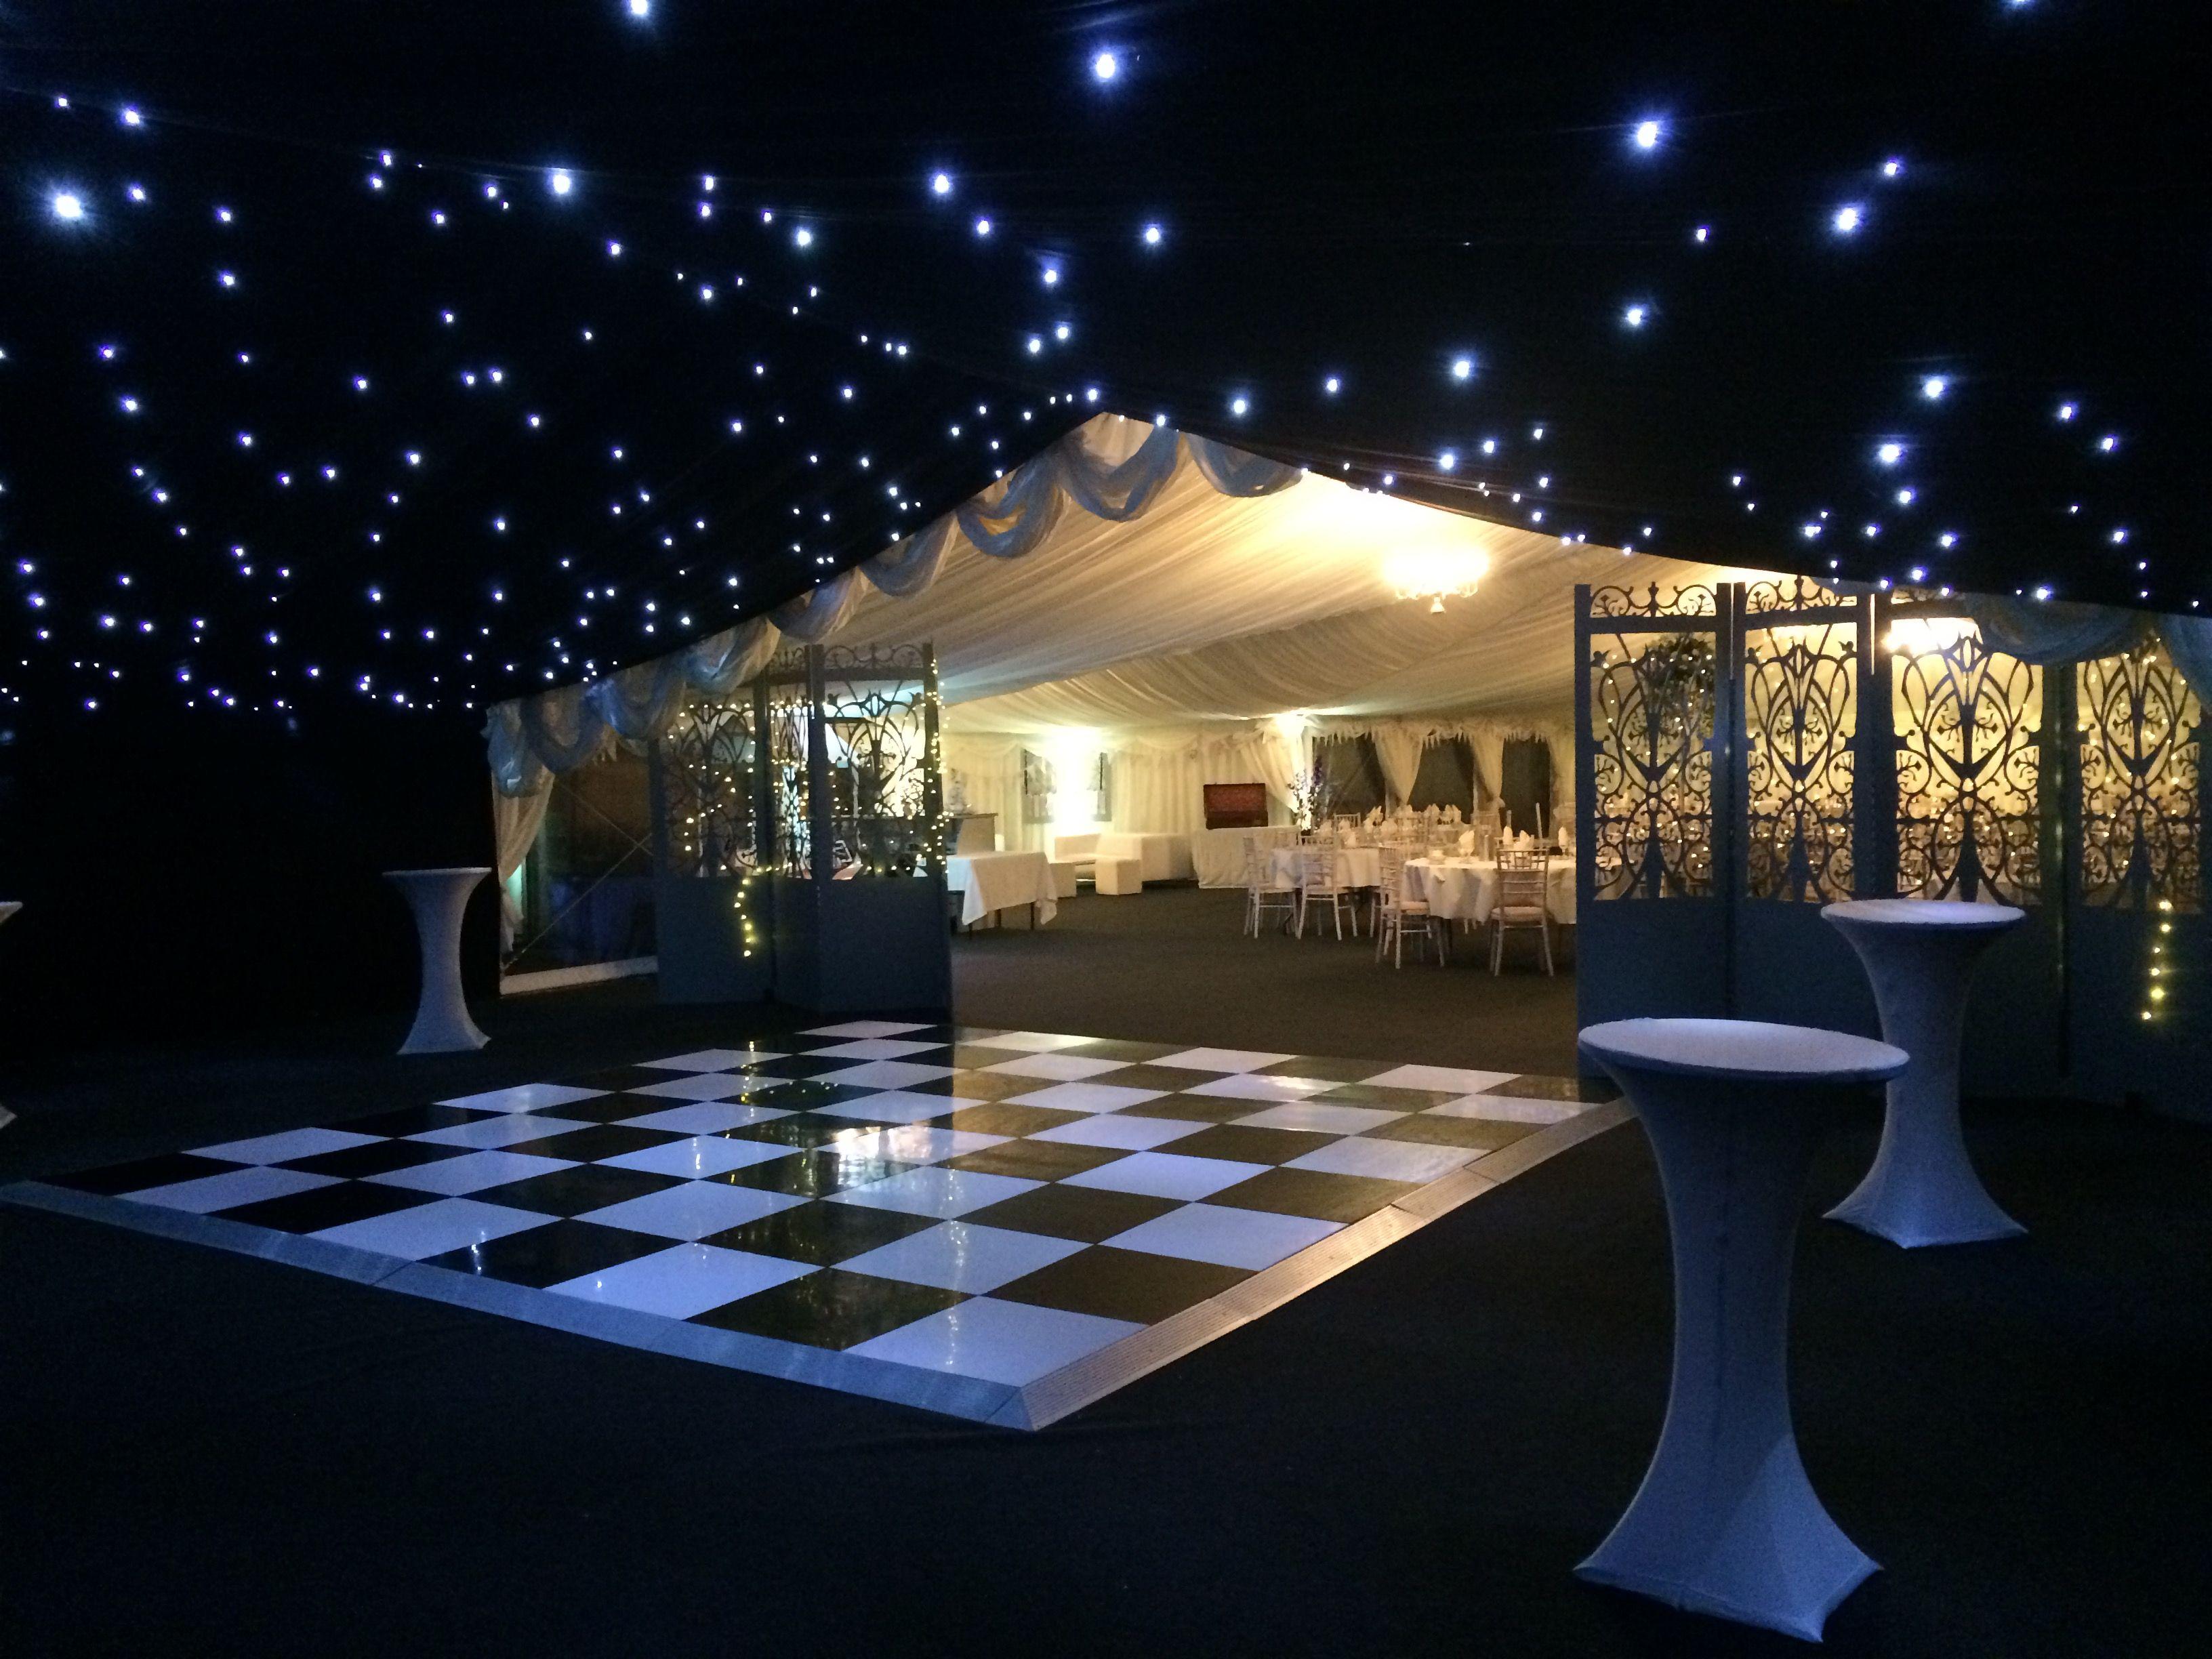 Marque dance floor with star light roof